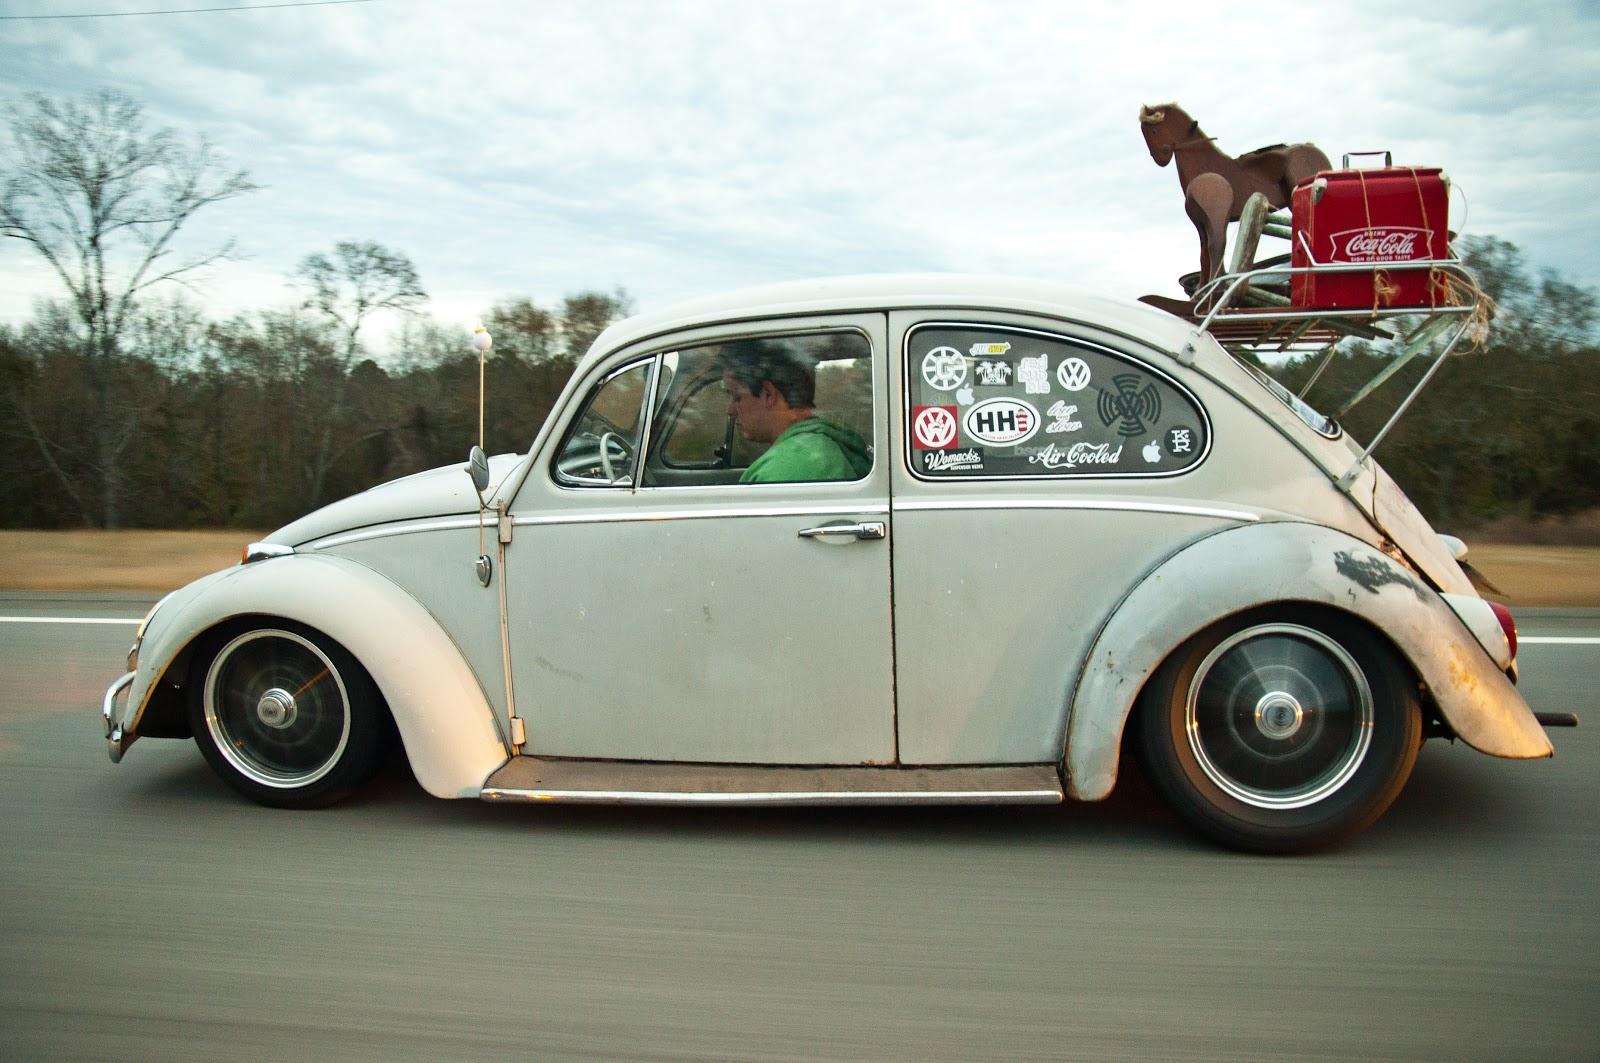 Otis - my '65 Beetle DSC_0101